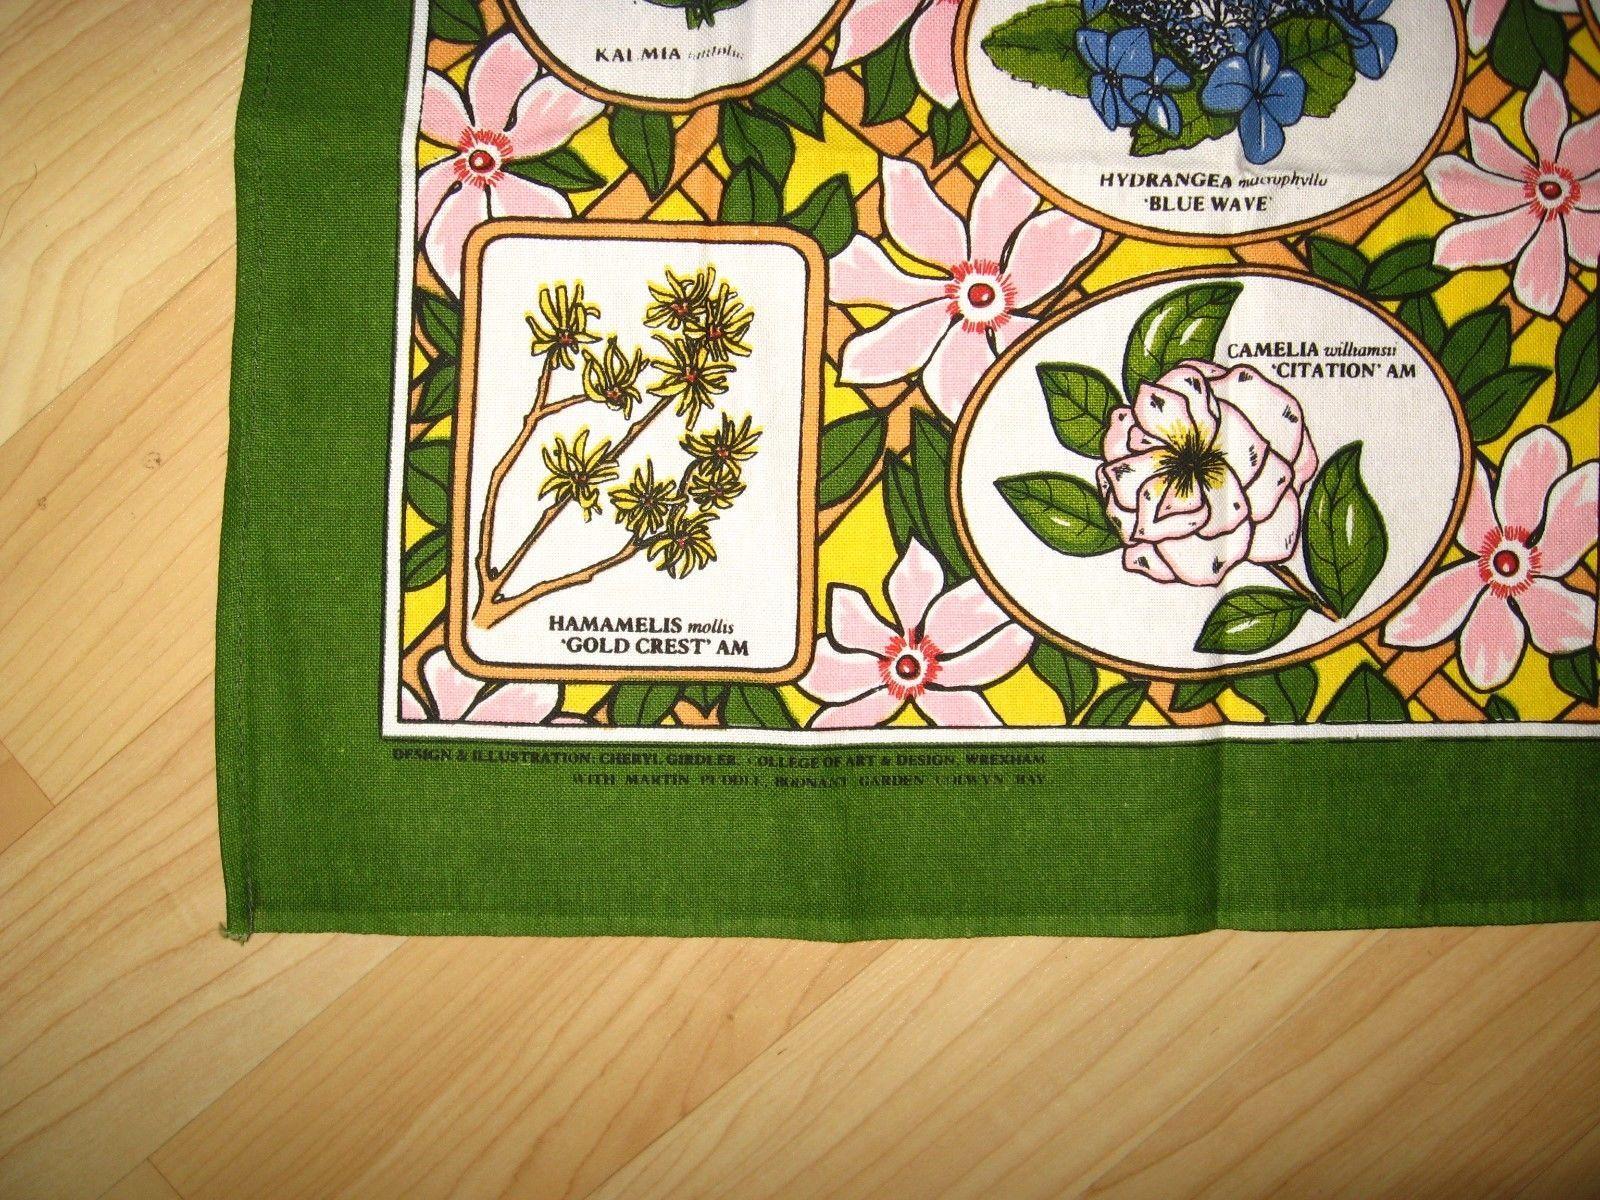 Bodnant Garden Souvenir Tea Towel - Vintage Sally Jane Textiles Colwyn Bay Wales image 4